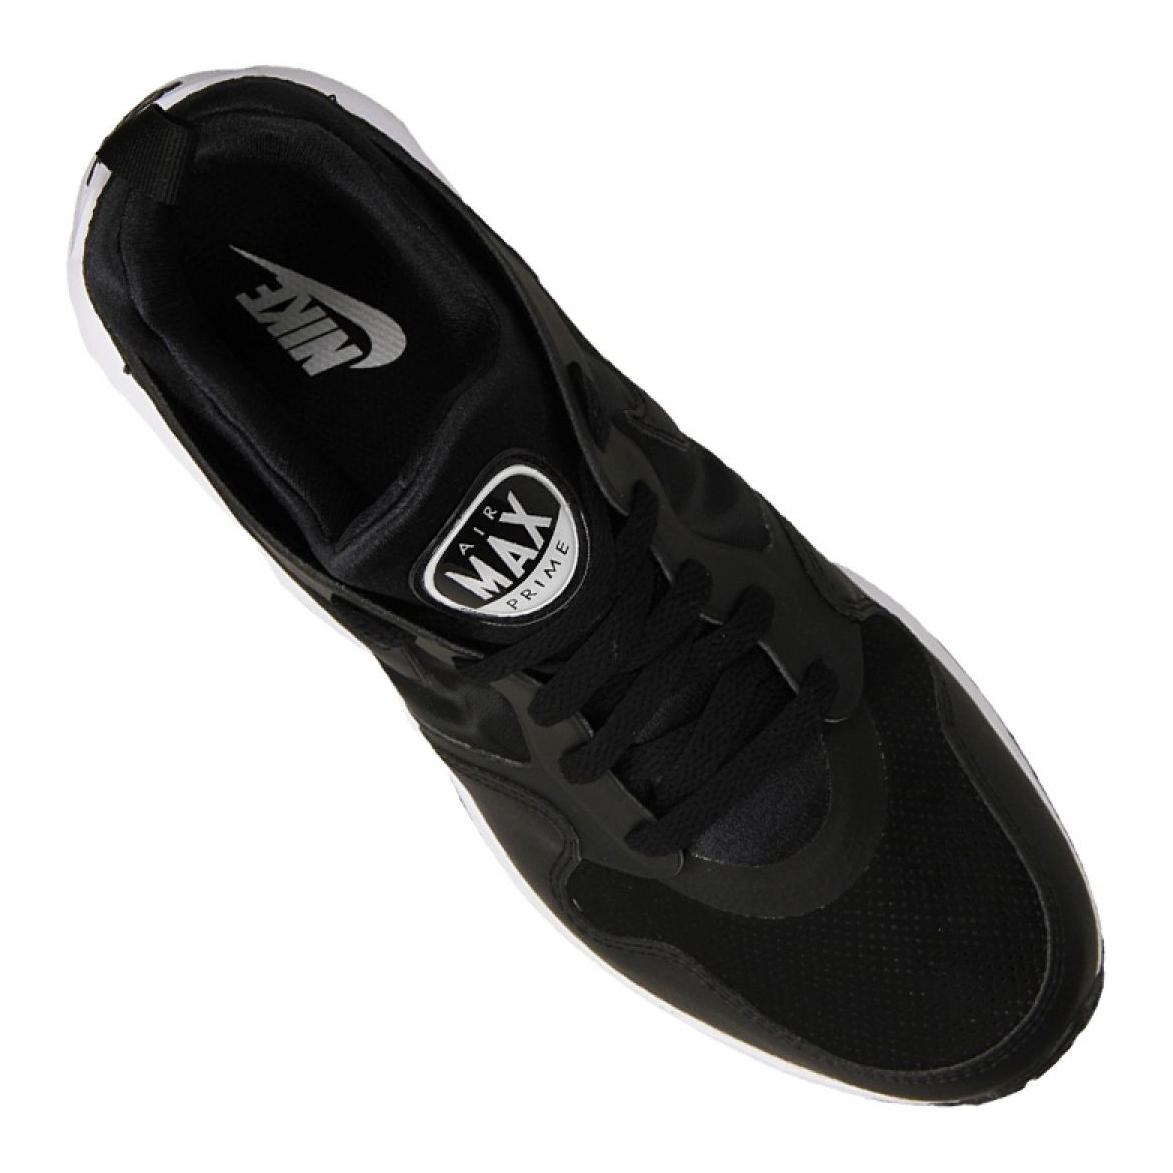 Nike Air Max Prime Sl M 876069 002 skor svart